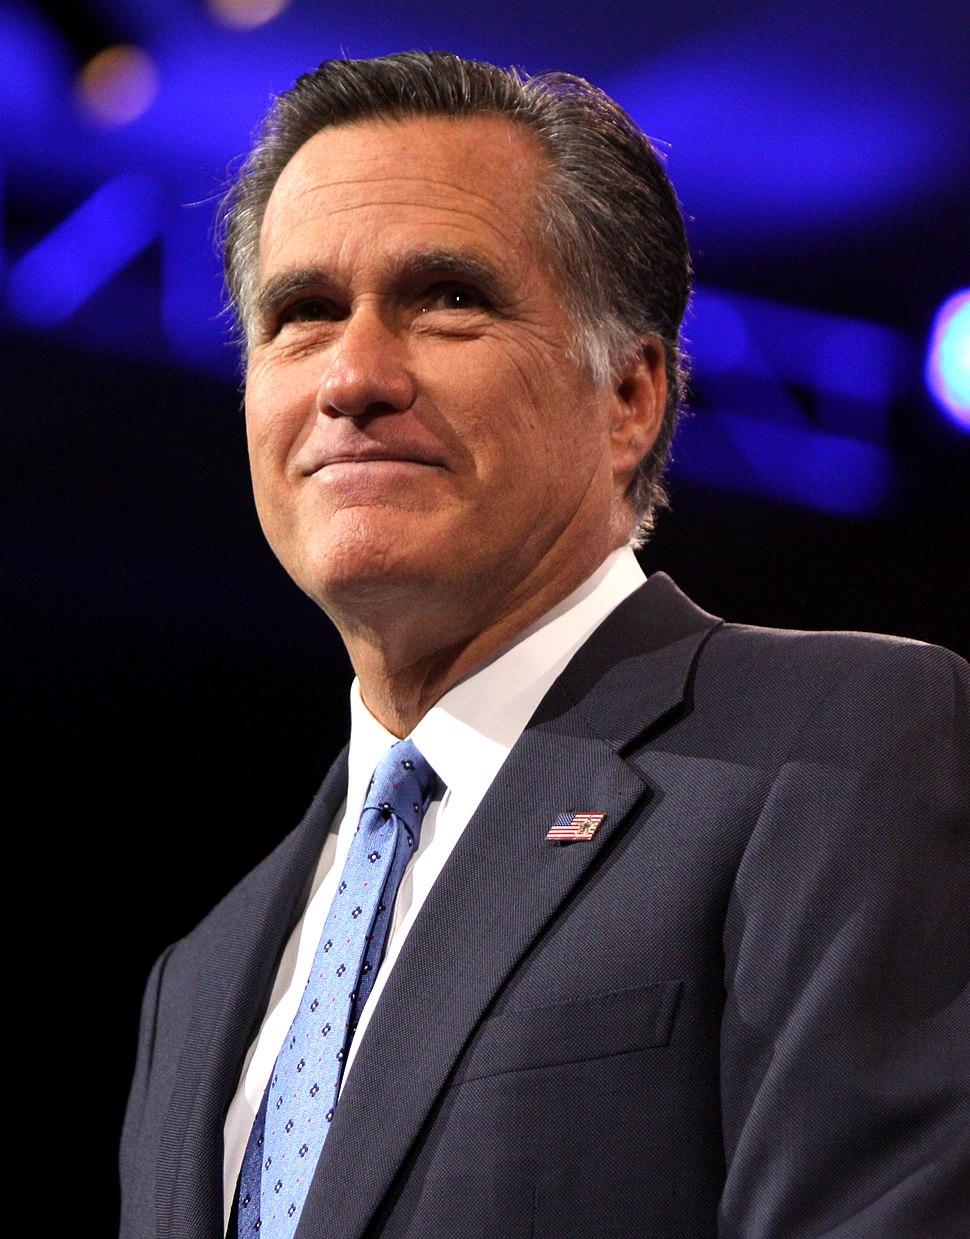 Former Massachusetts Governor and 2012 Republican Presidential nominee Mitt Romney